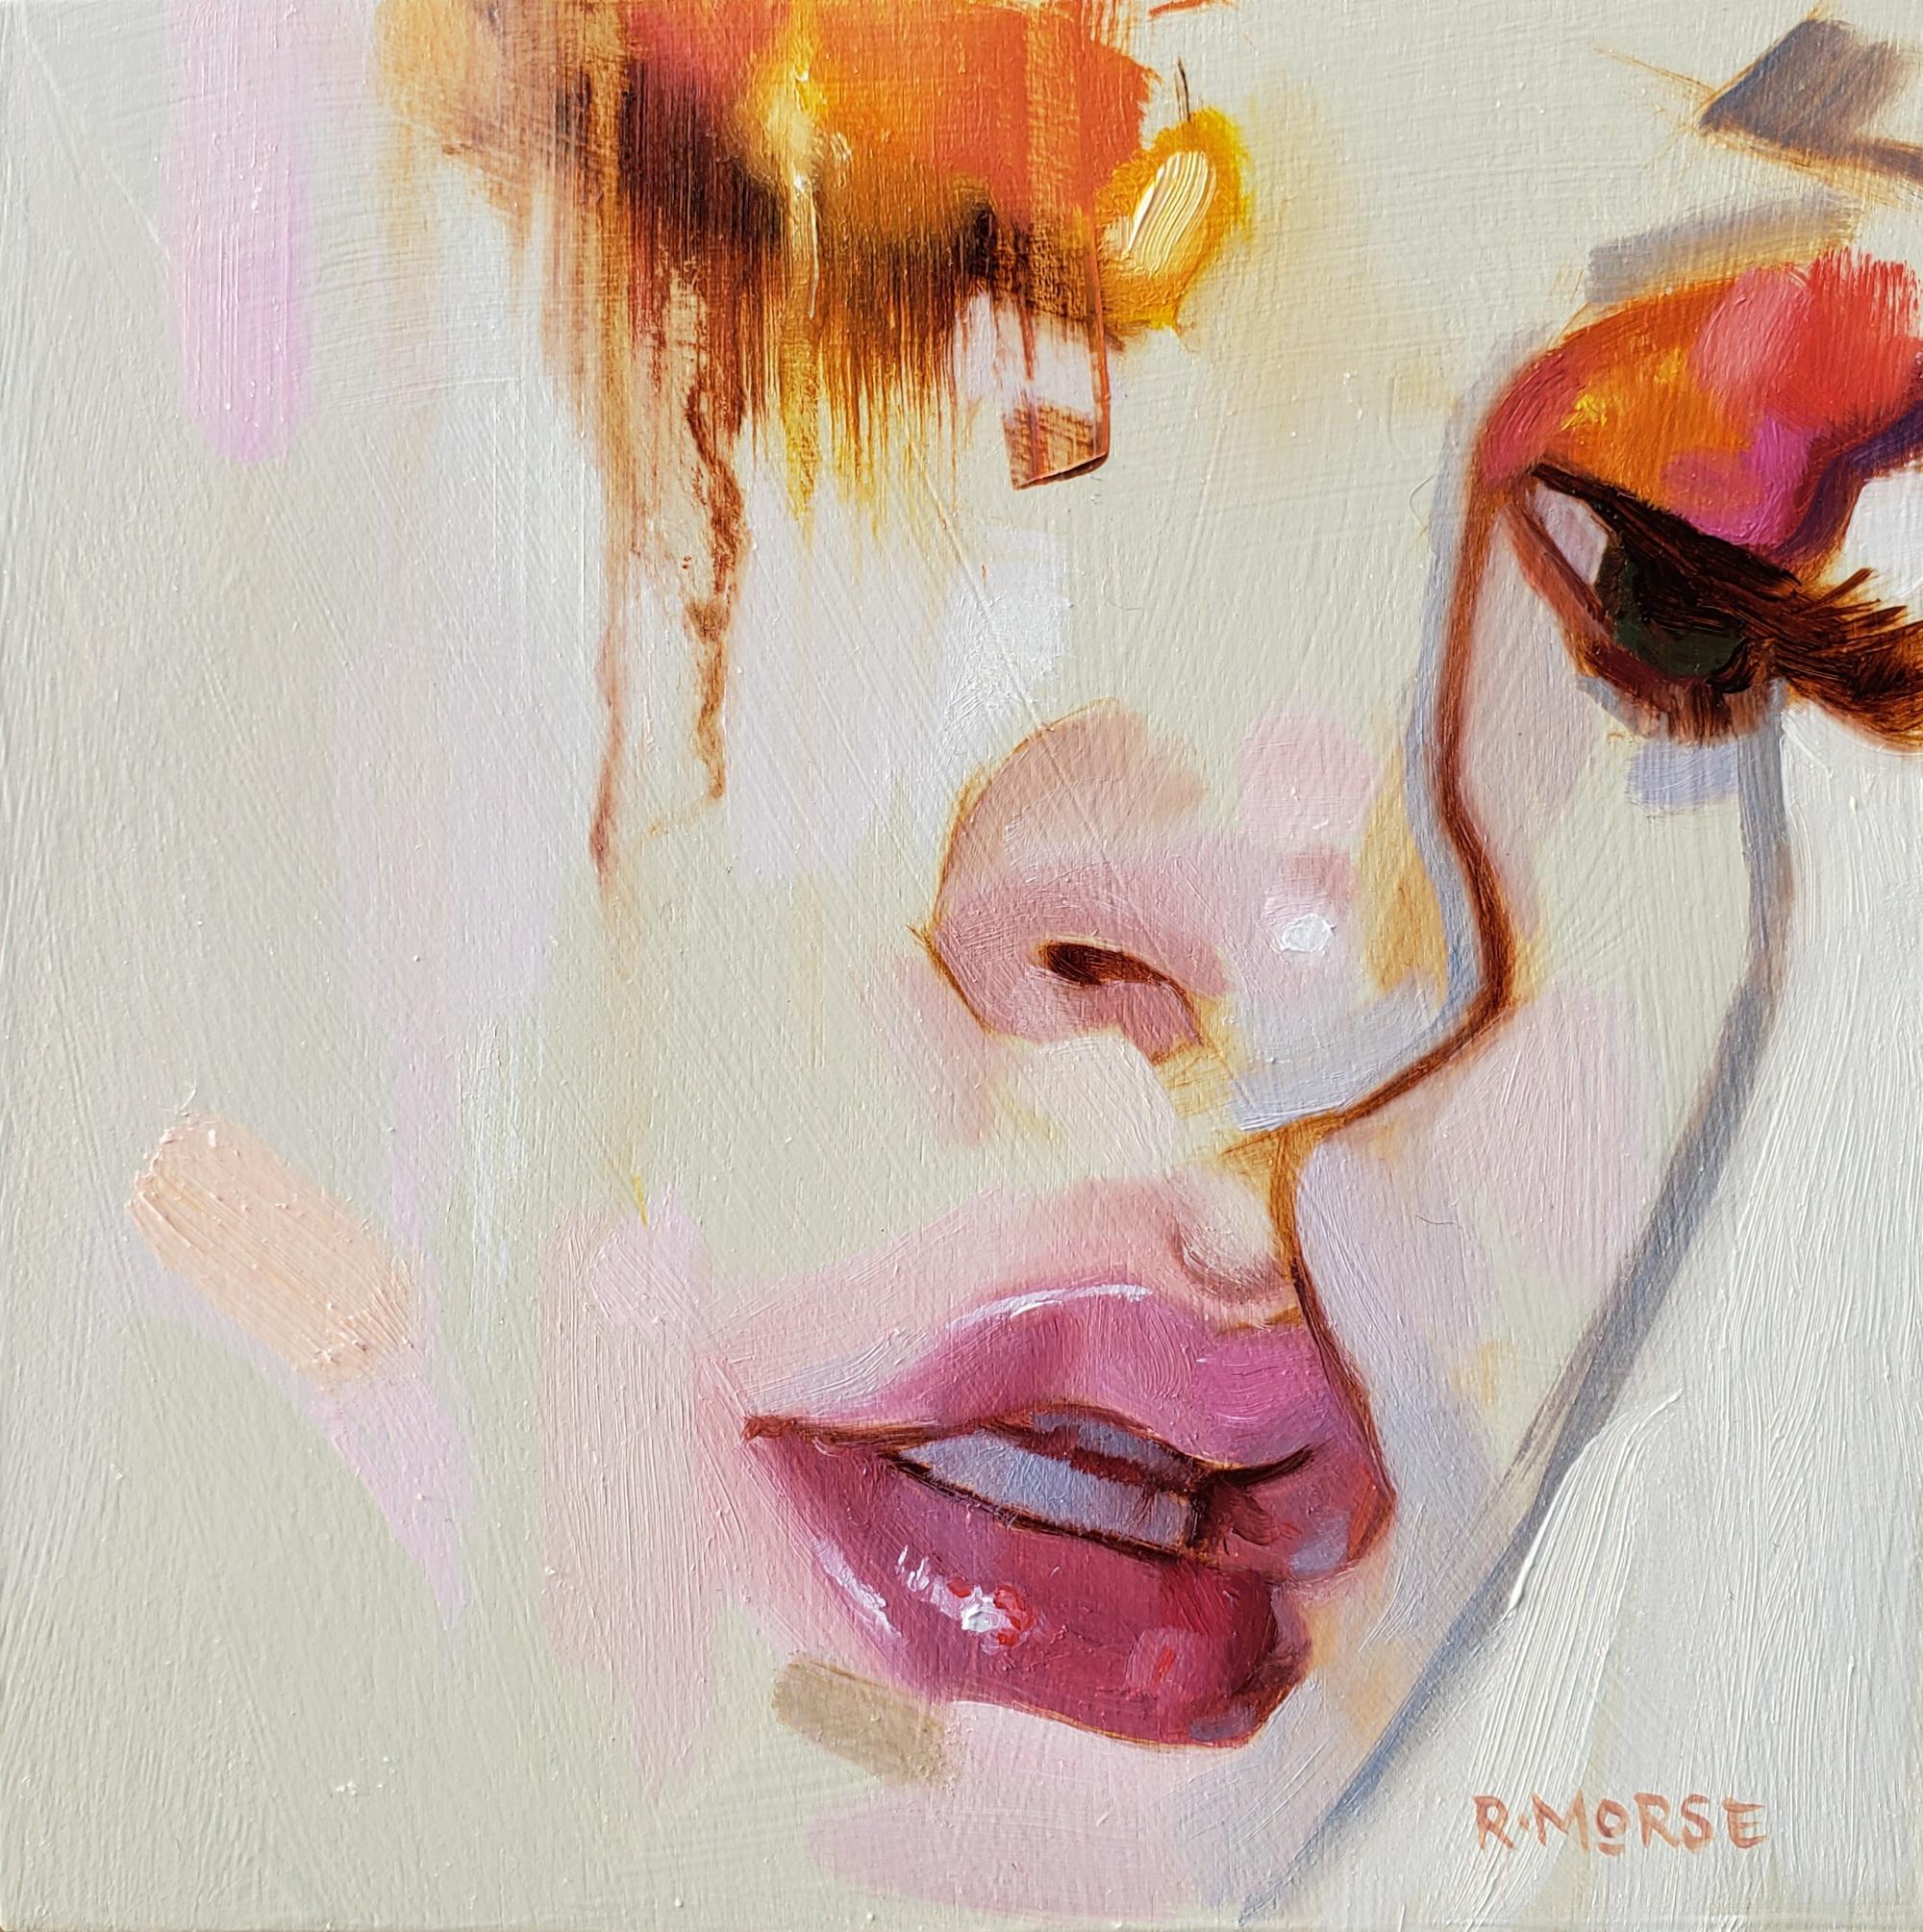 Sentient by Ryan Morse